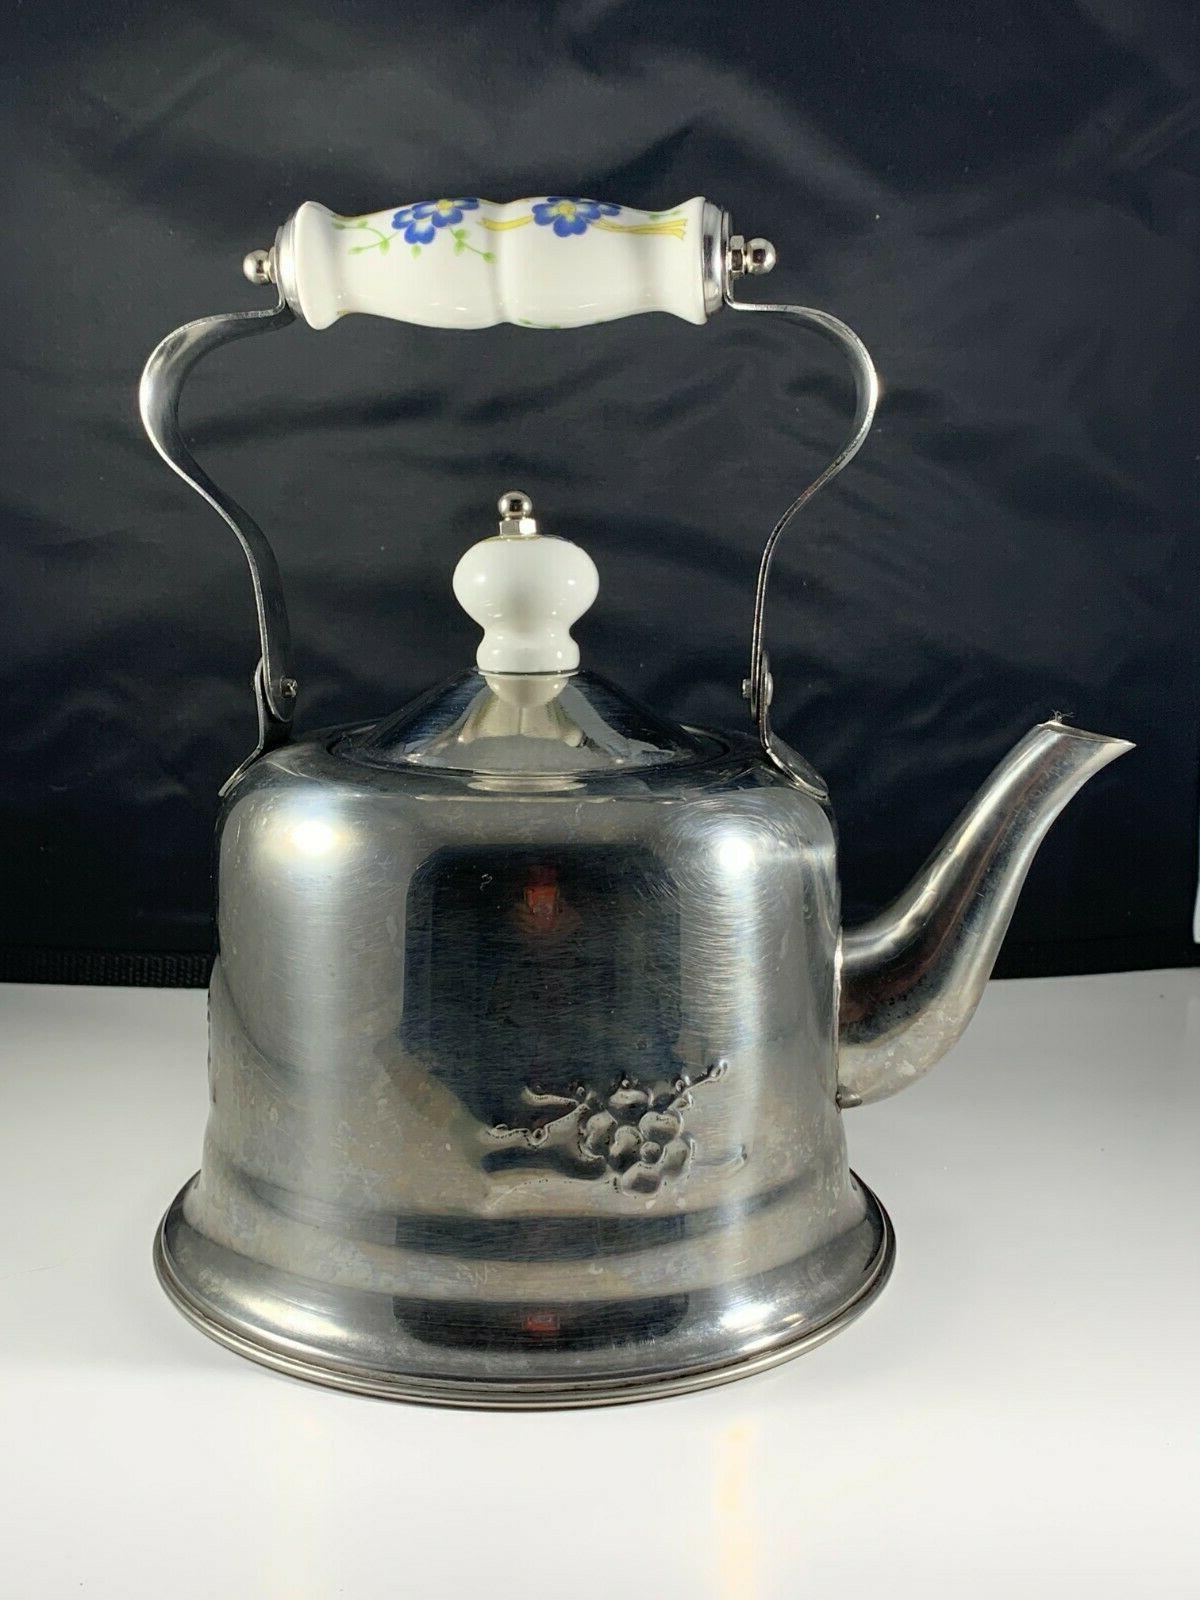 vintage tea kettle pot stainless steel